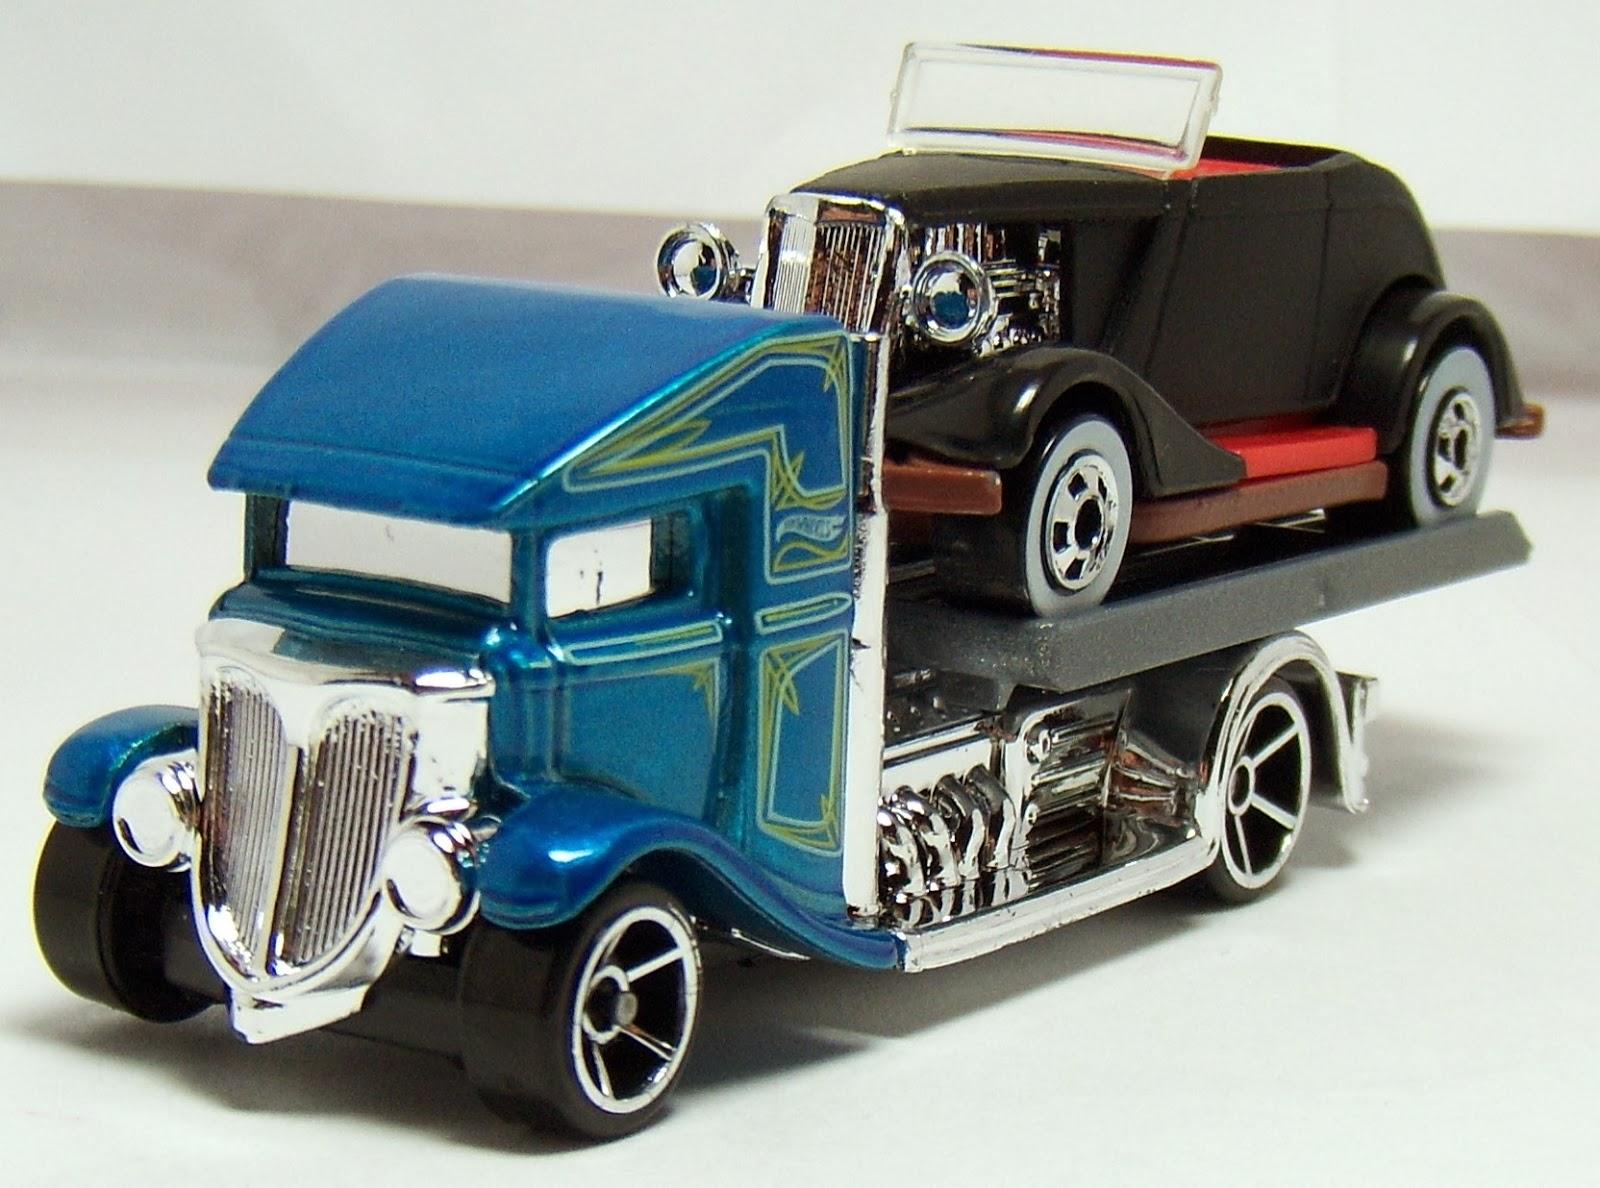 Flatbed haulers part 1 hot wheels fast bed hauler cabbin fever and matchbox flatbed truck s